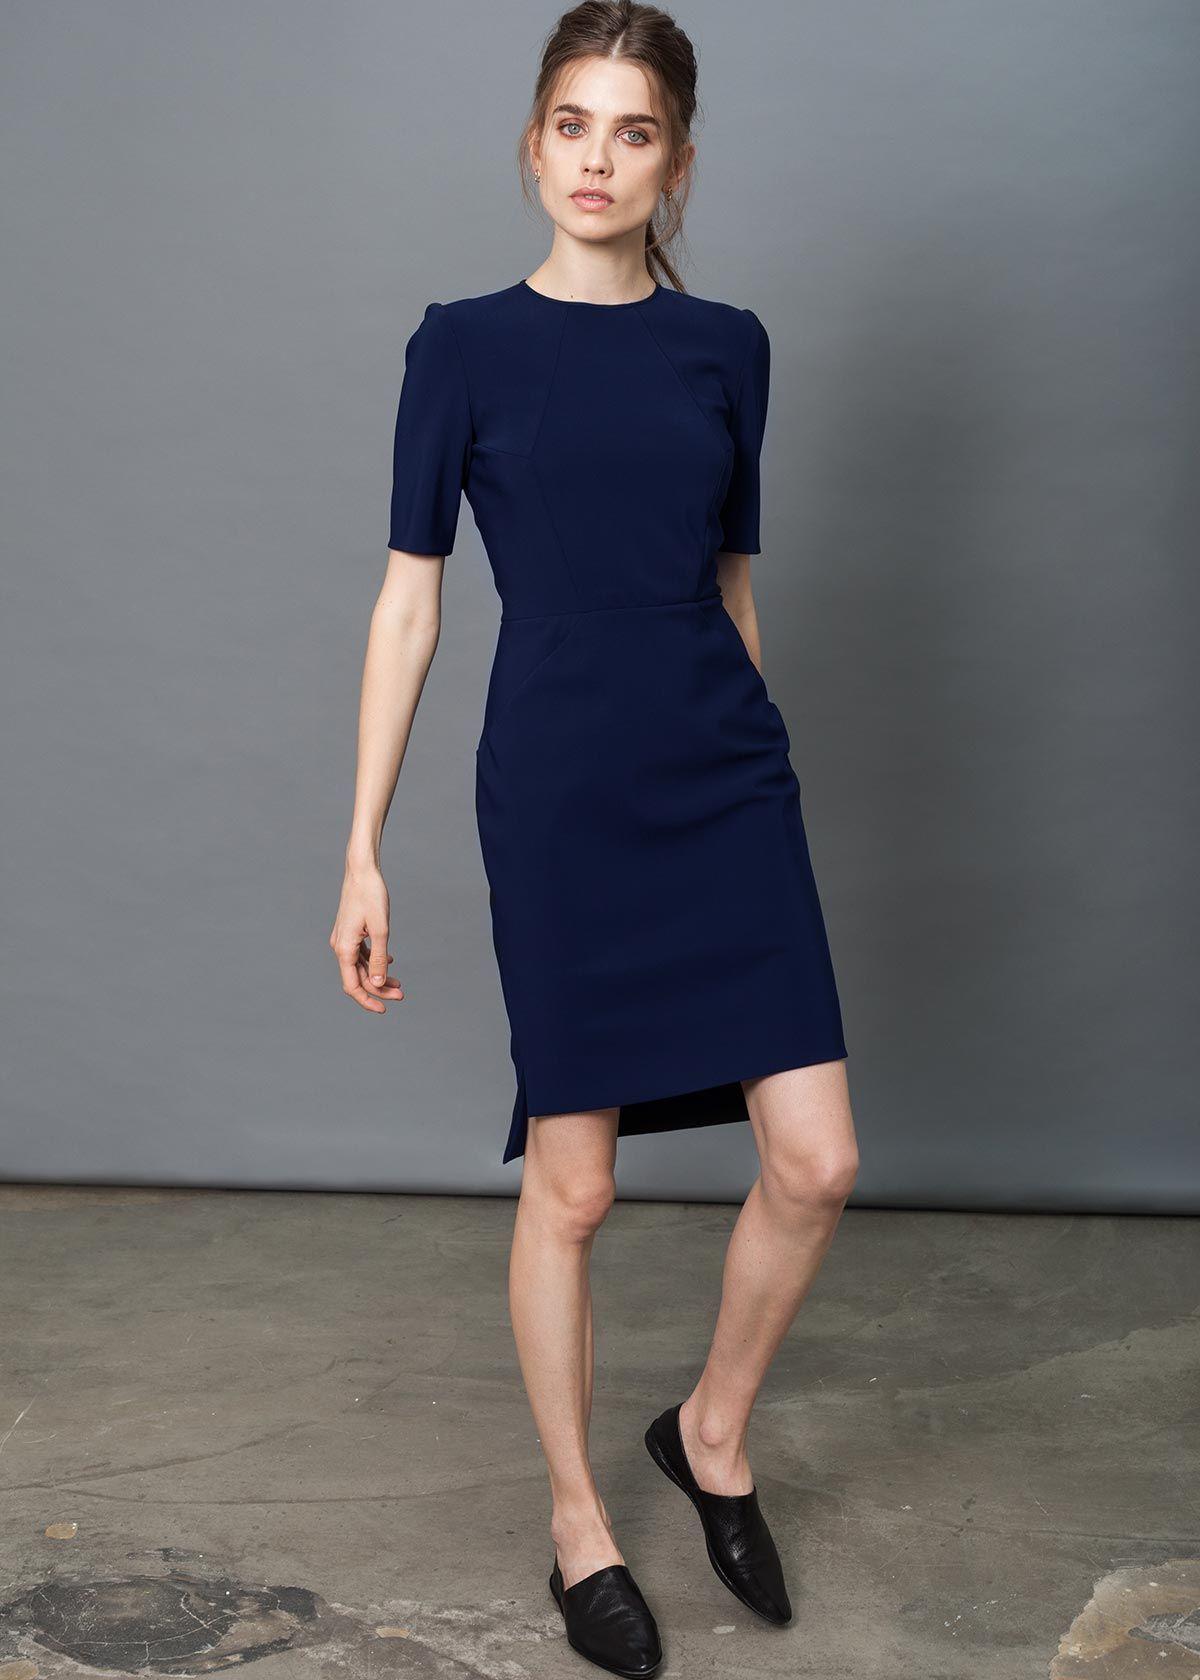 Victory Dress Black Dai Short Sleeve Shift Dress Dresses Staple Dress [ 1680 x 1200 Pixel ]